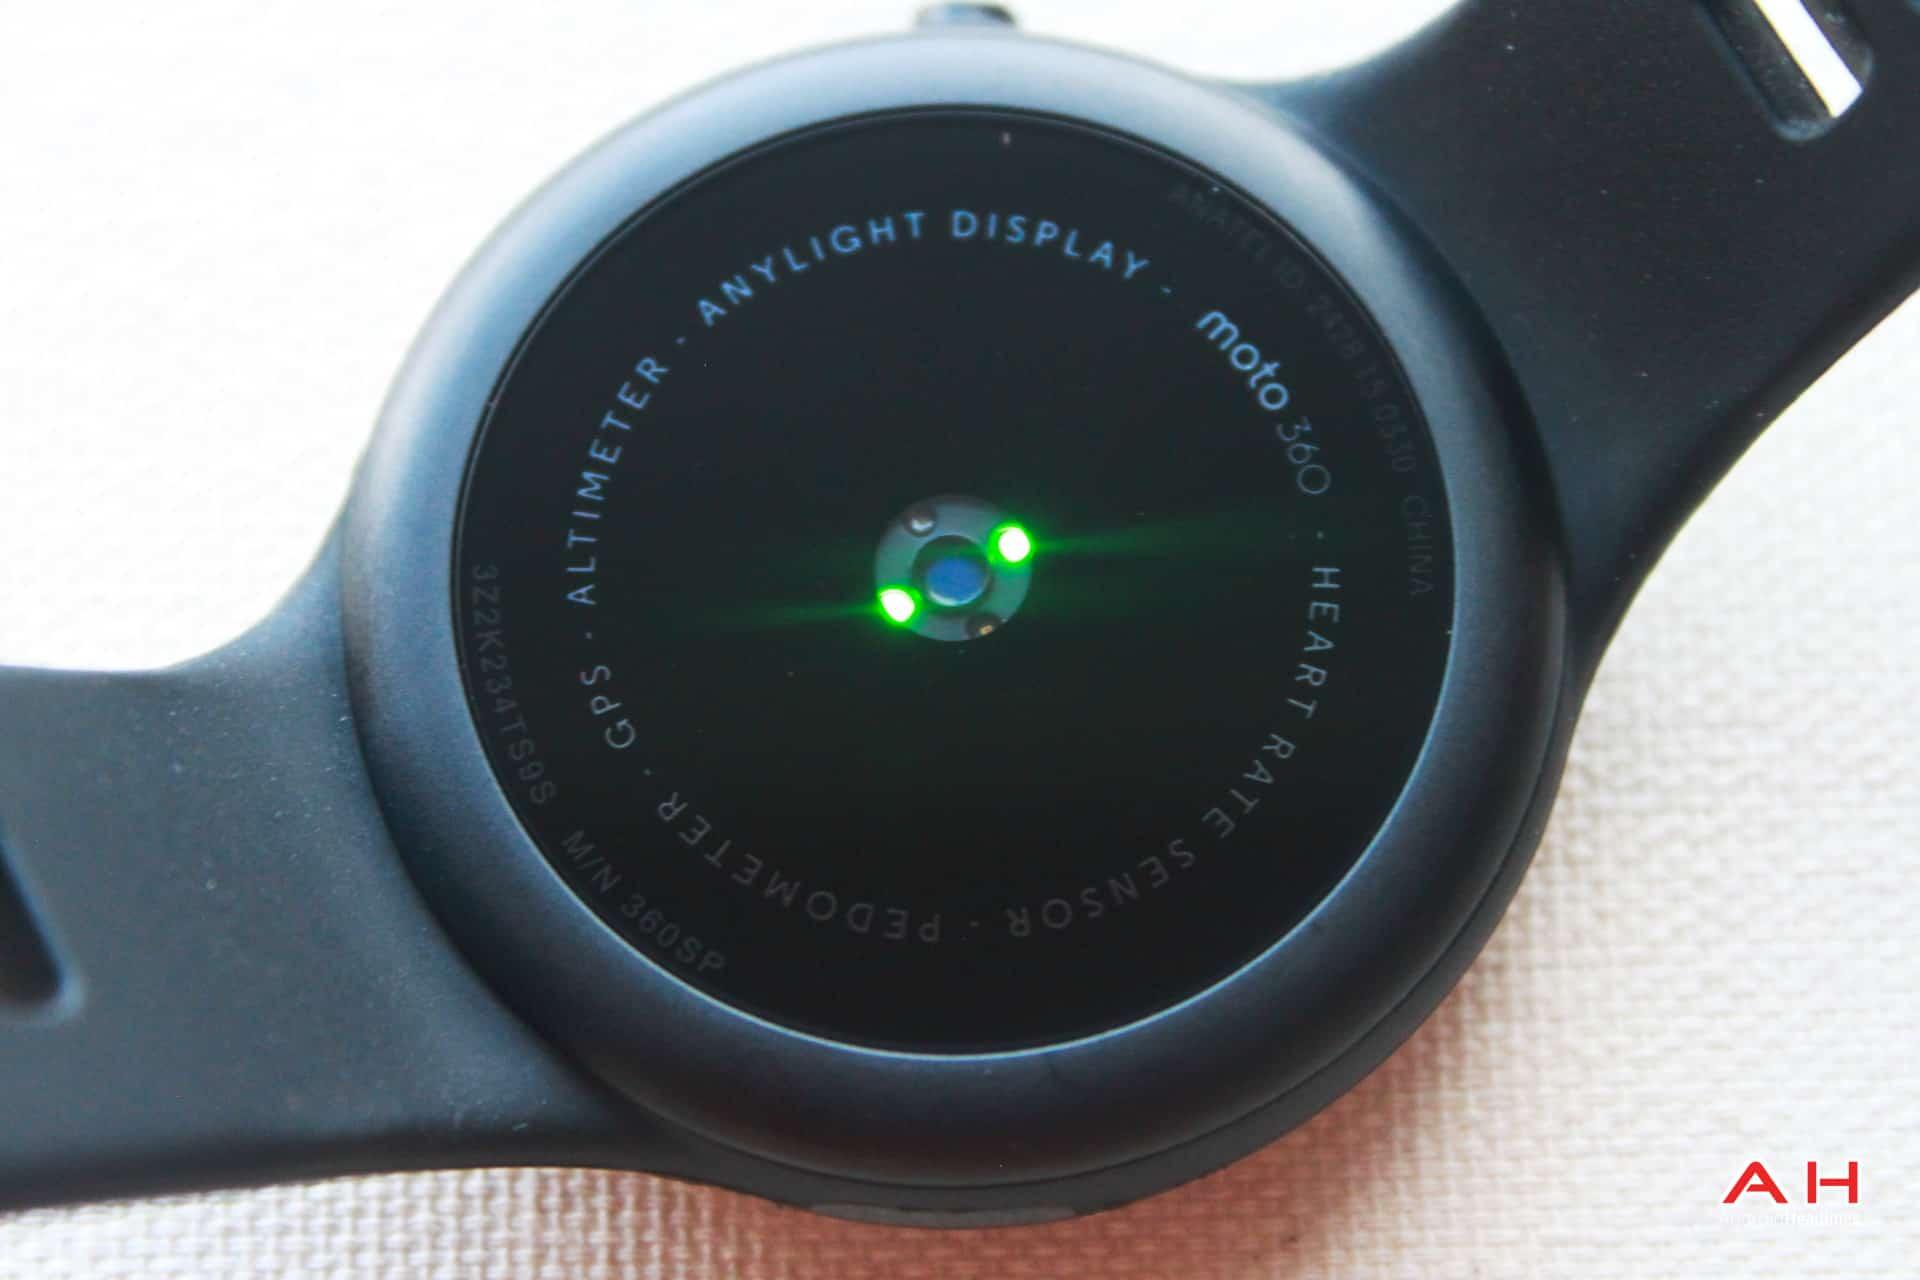 motorola 360 sport. heart rate sensor ah moto 360 sport-21 motorola sport s